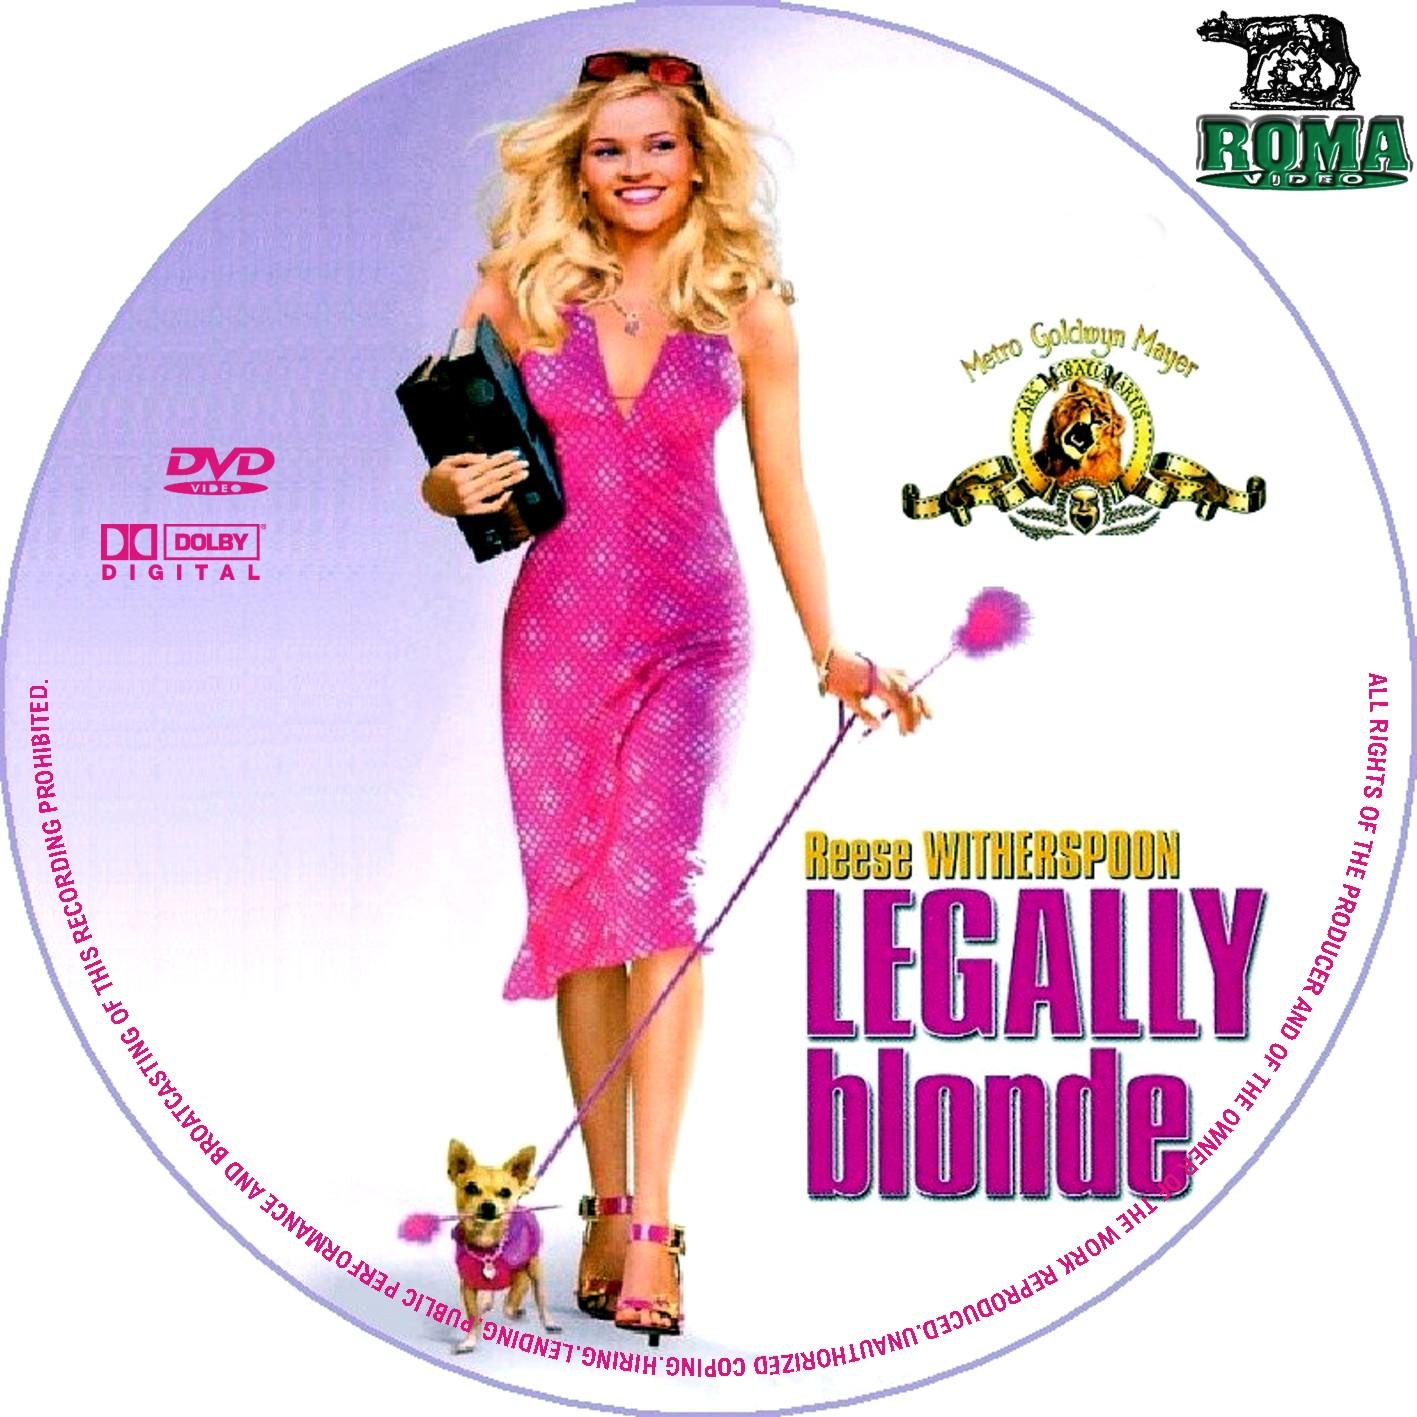 Blonde stereotype